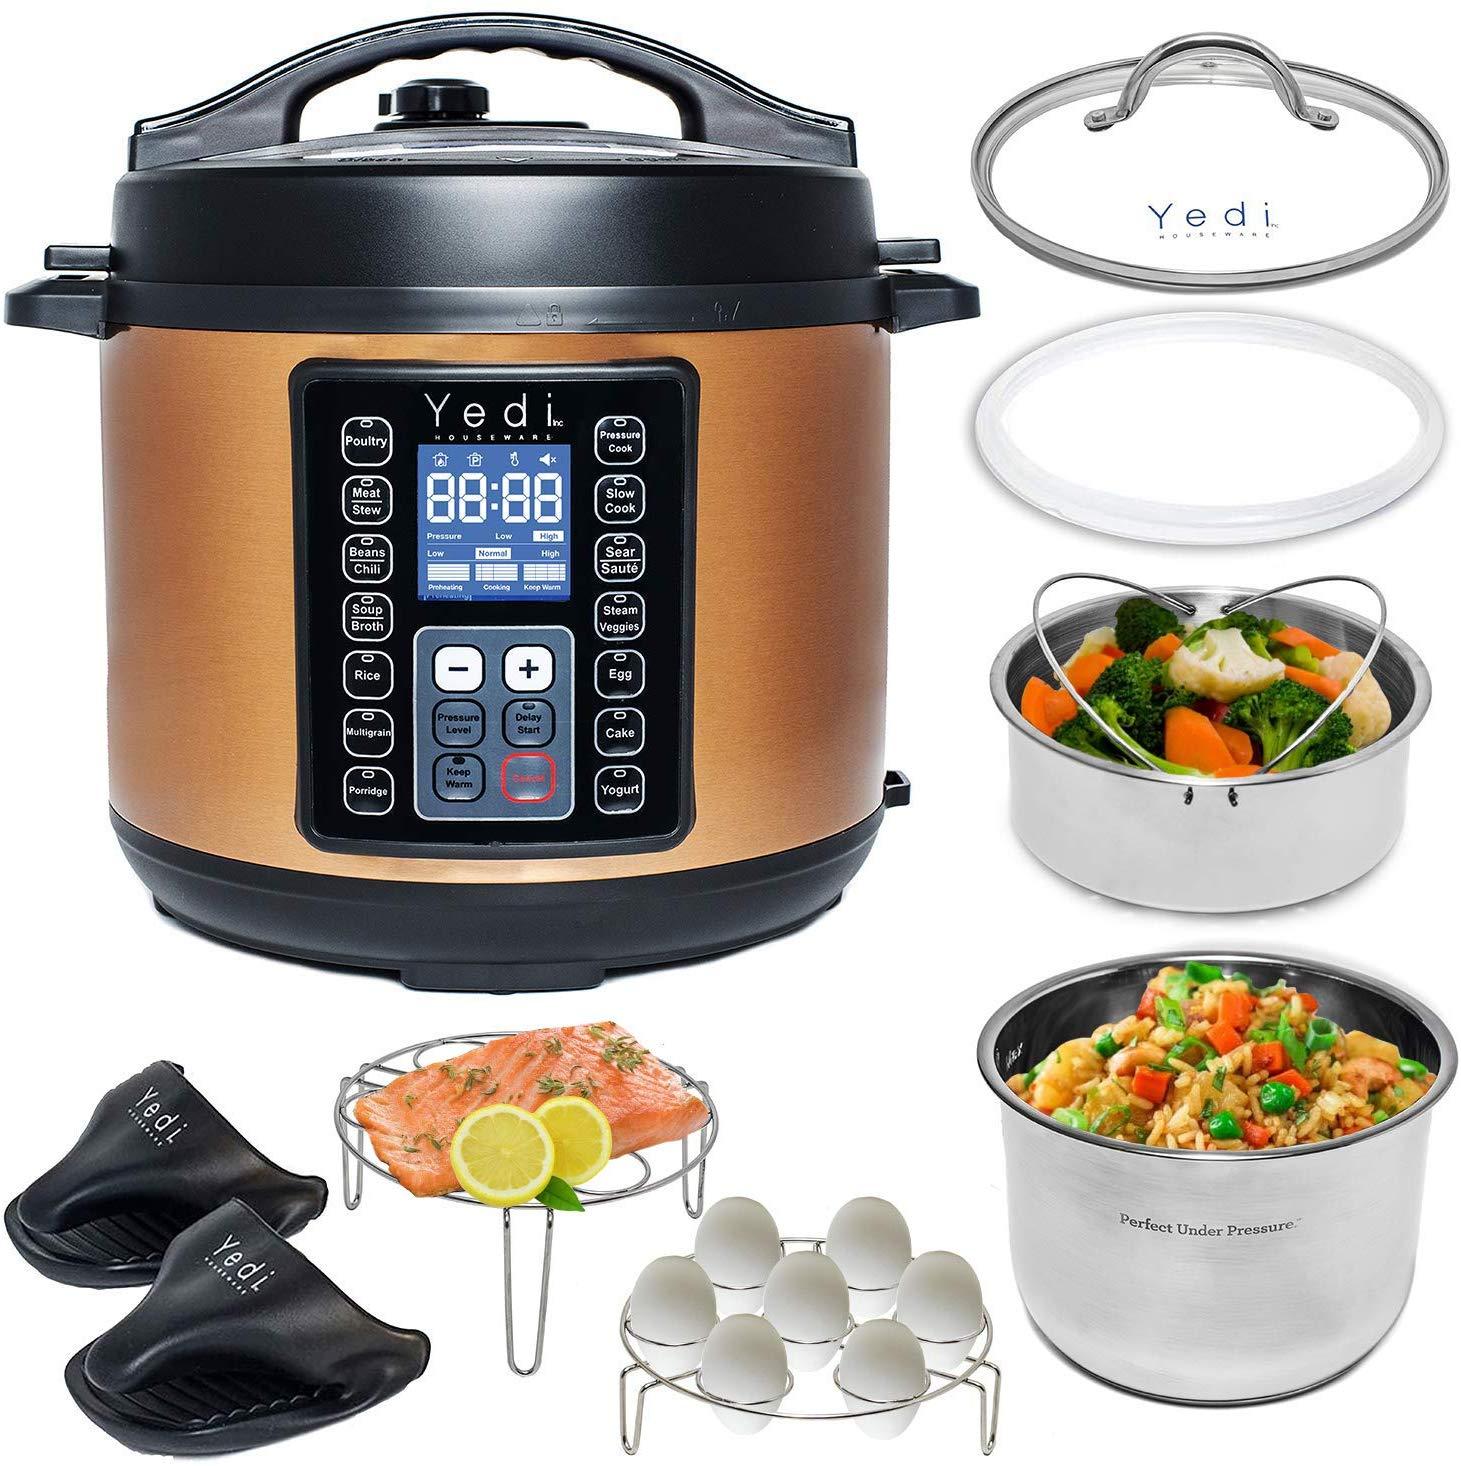 Yedi Houseware 9-in-1 total package instant pressure cooker